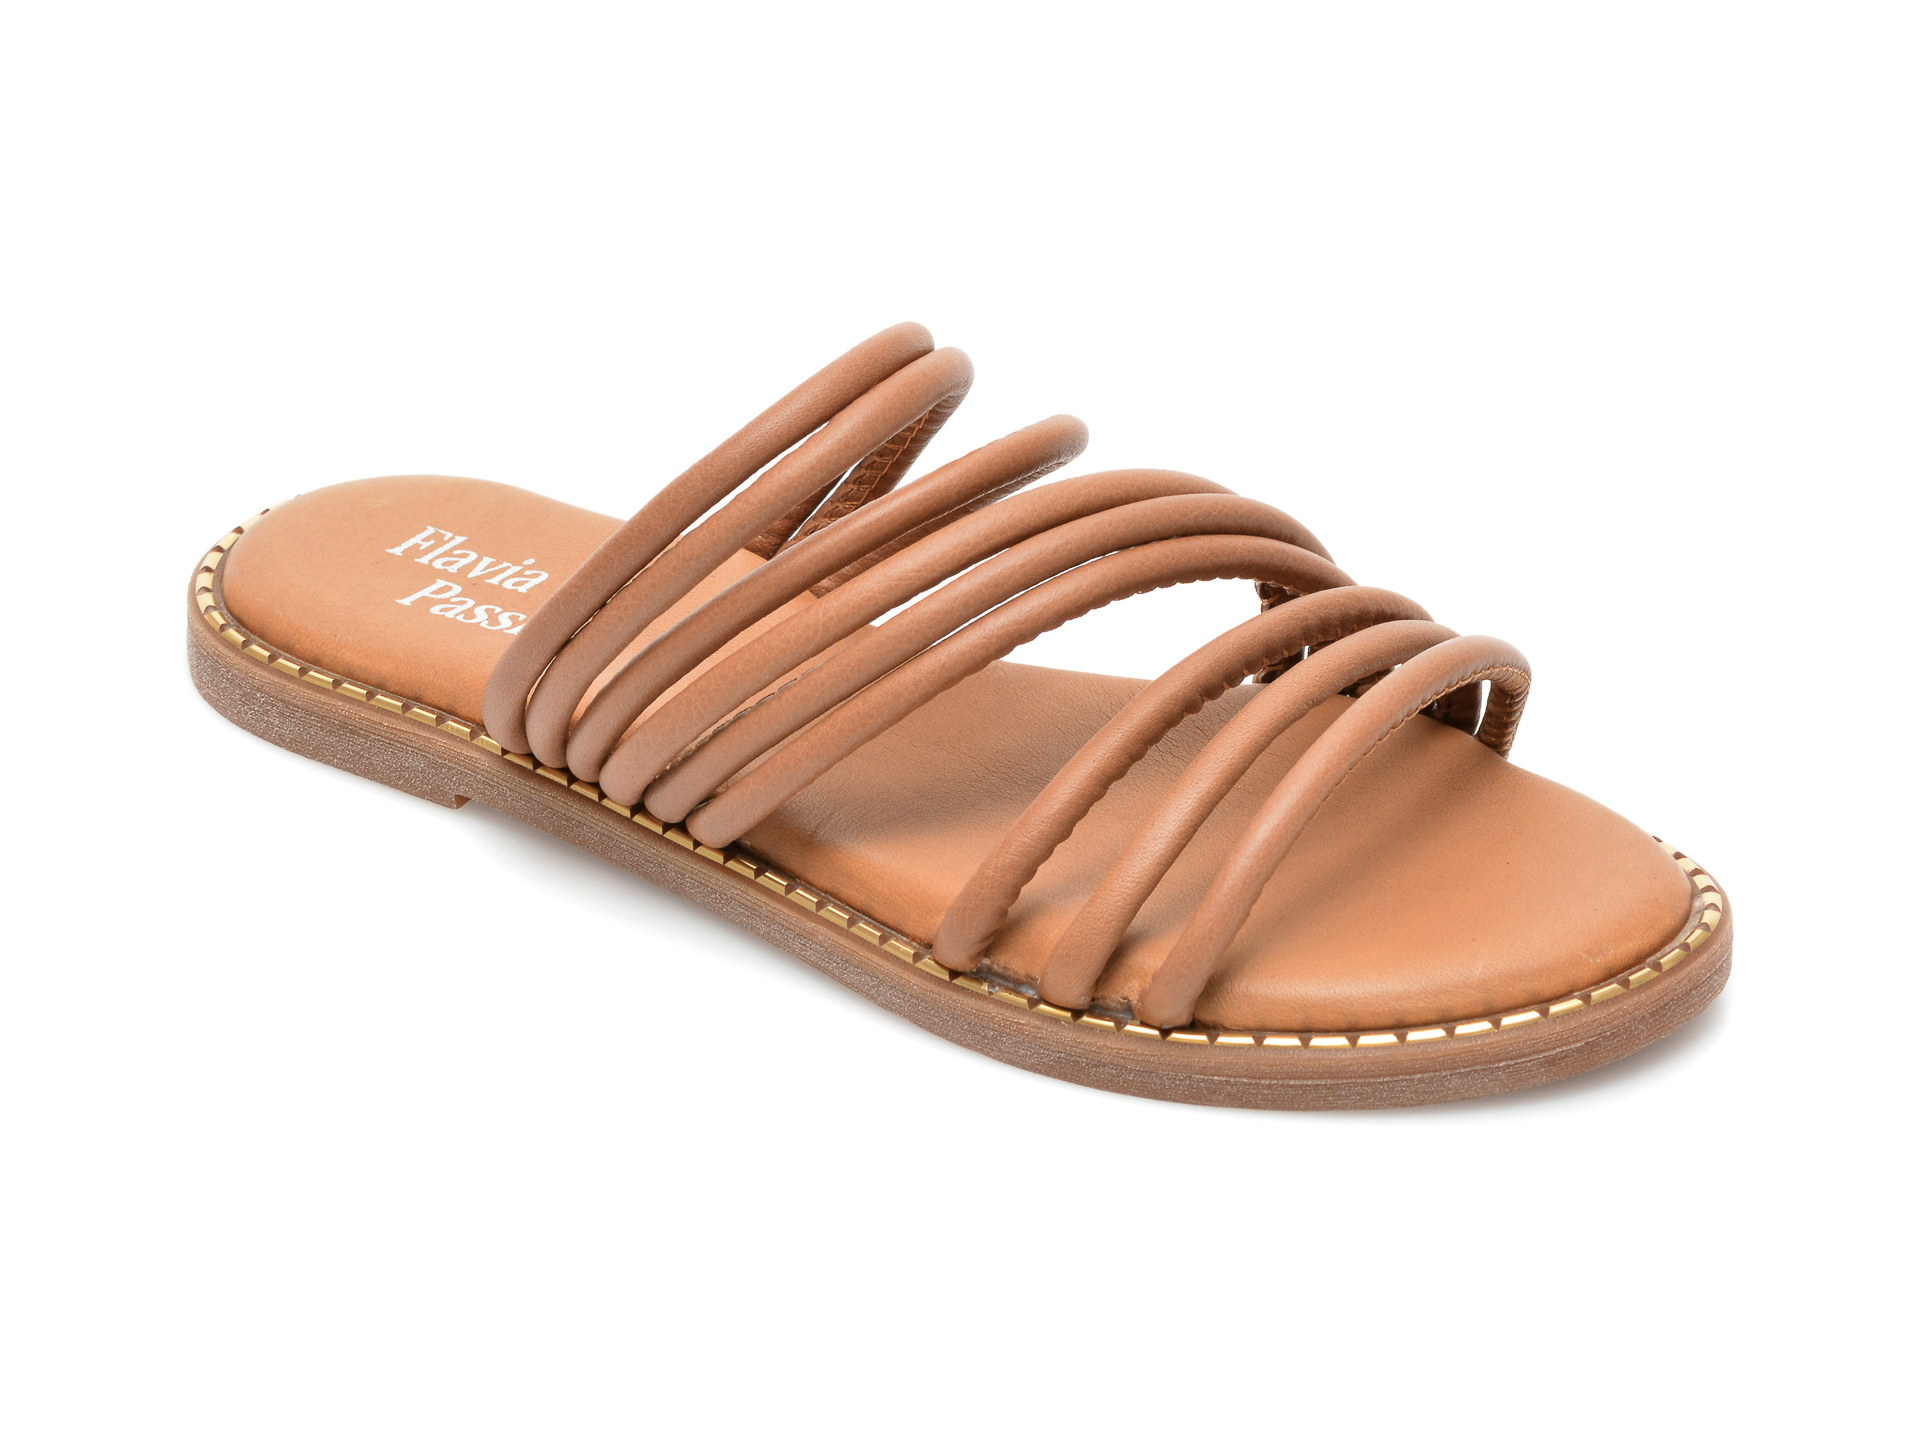 Papuci FLAVIA PASSINI maro, 3044, din piele naturala imagine otter.ro 2021